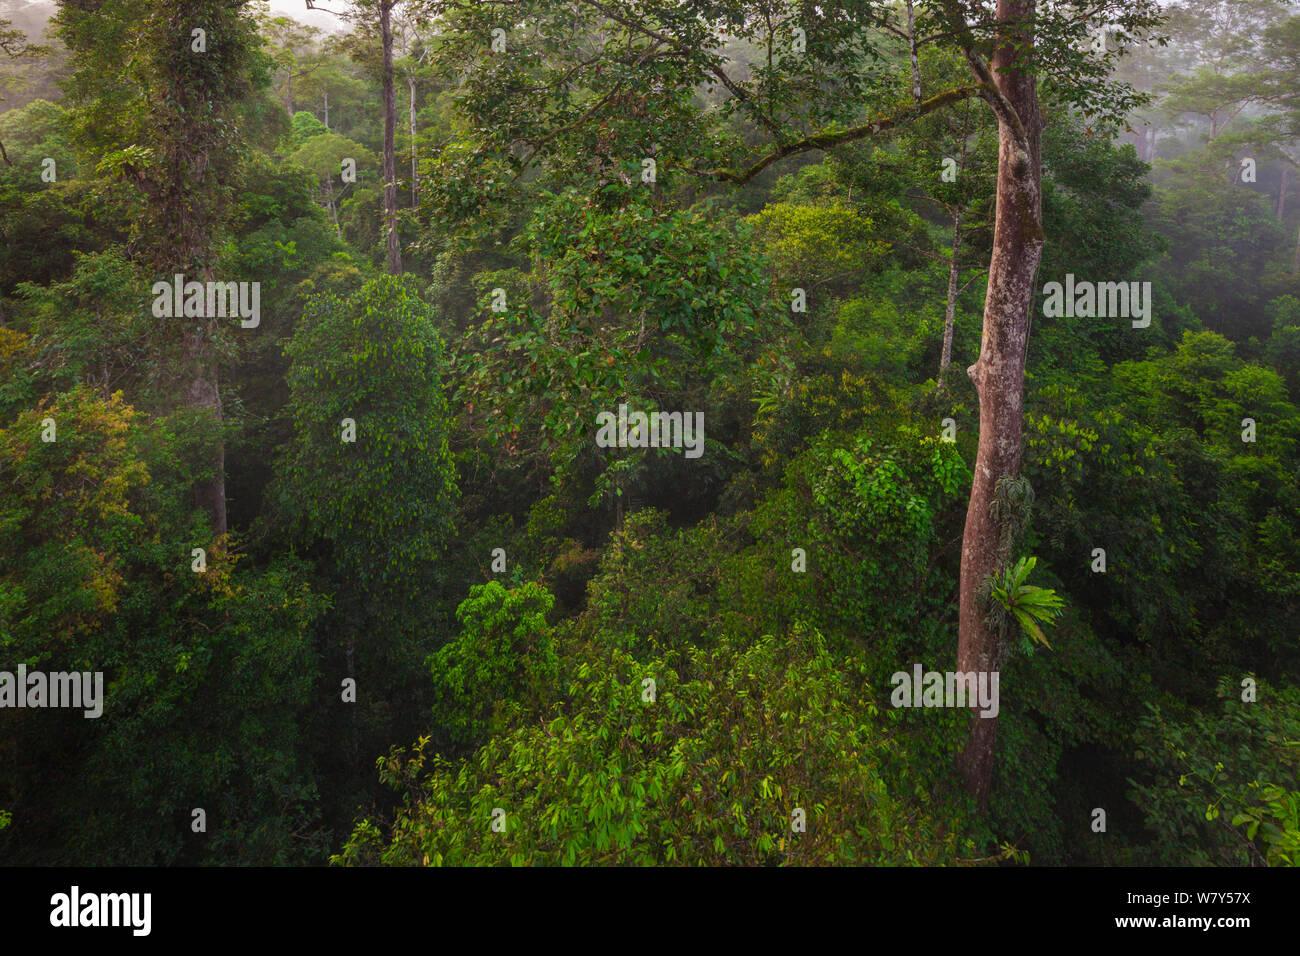 Lowland dipterocarp rainforest canopy. Danum Valley, Sabah, Borneo, May 2011. Stock Photo